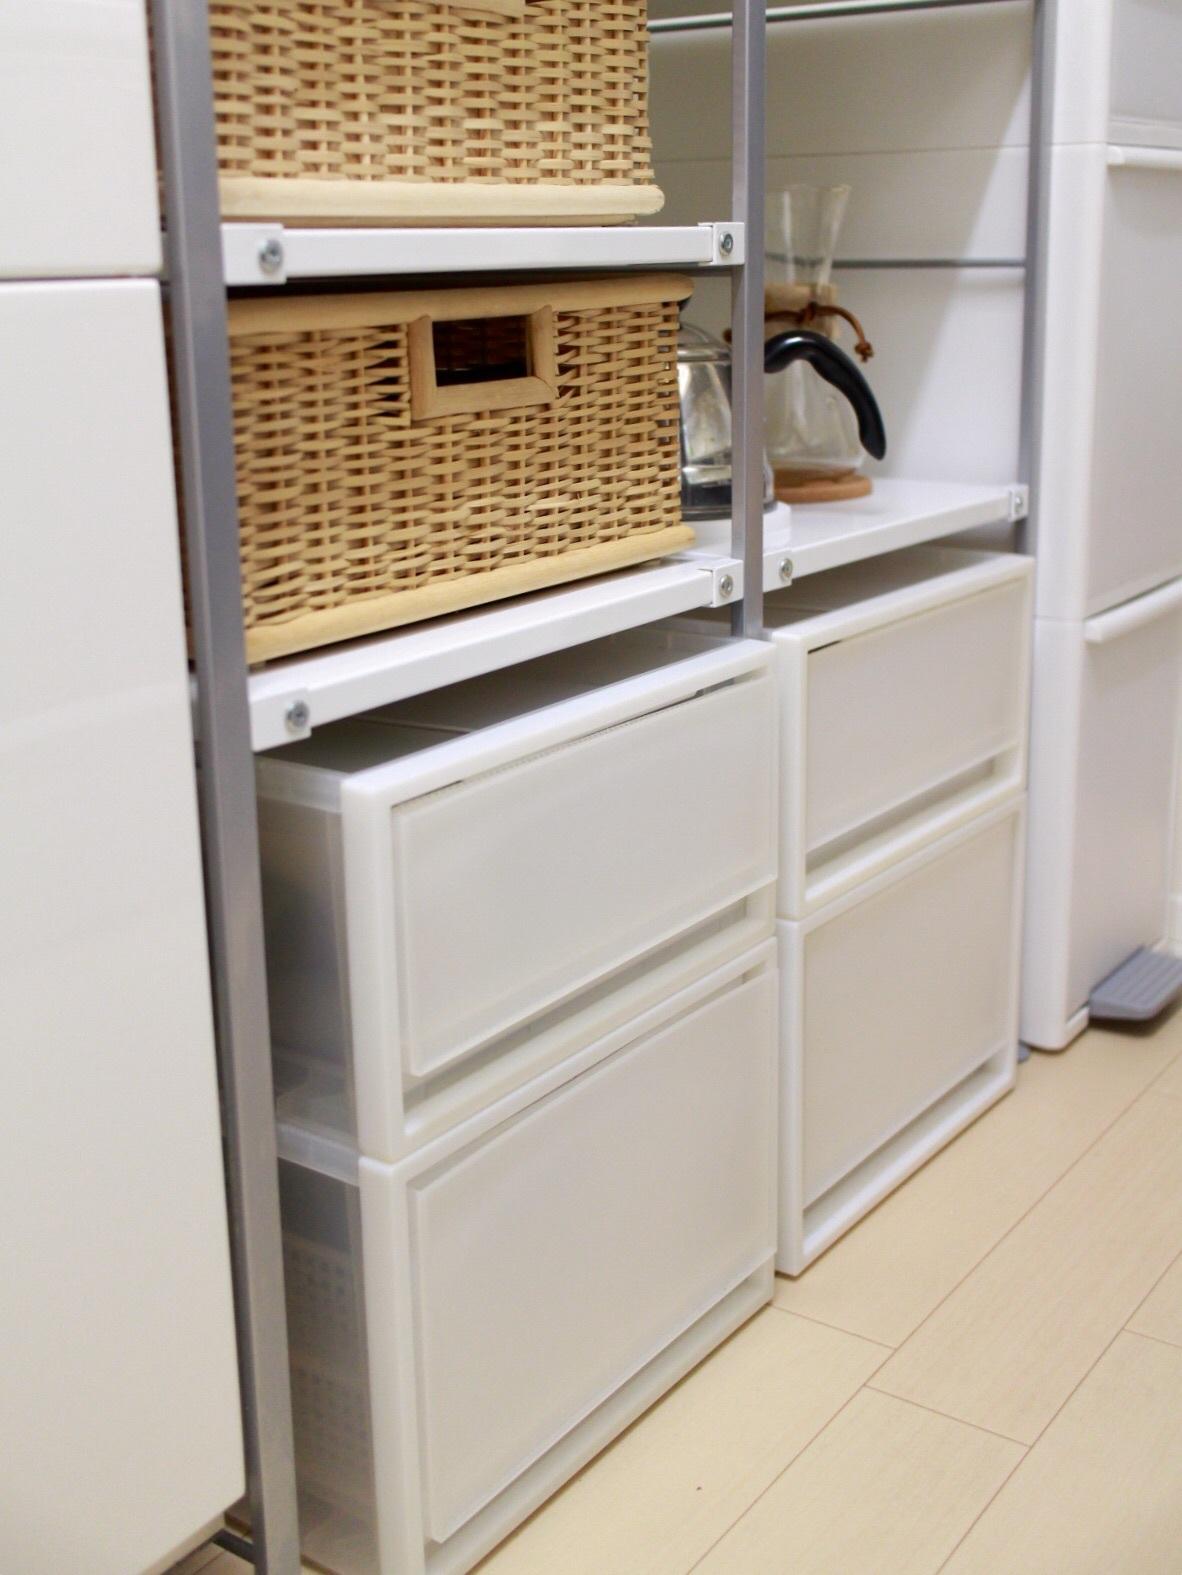 kitchenプチ改造〜after〜(前編)_1_9